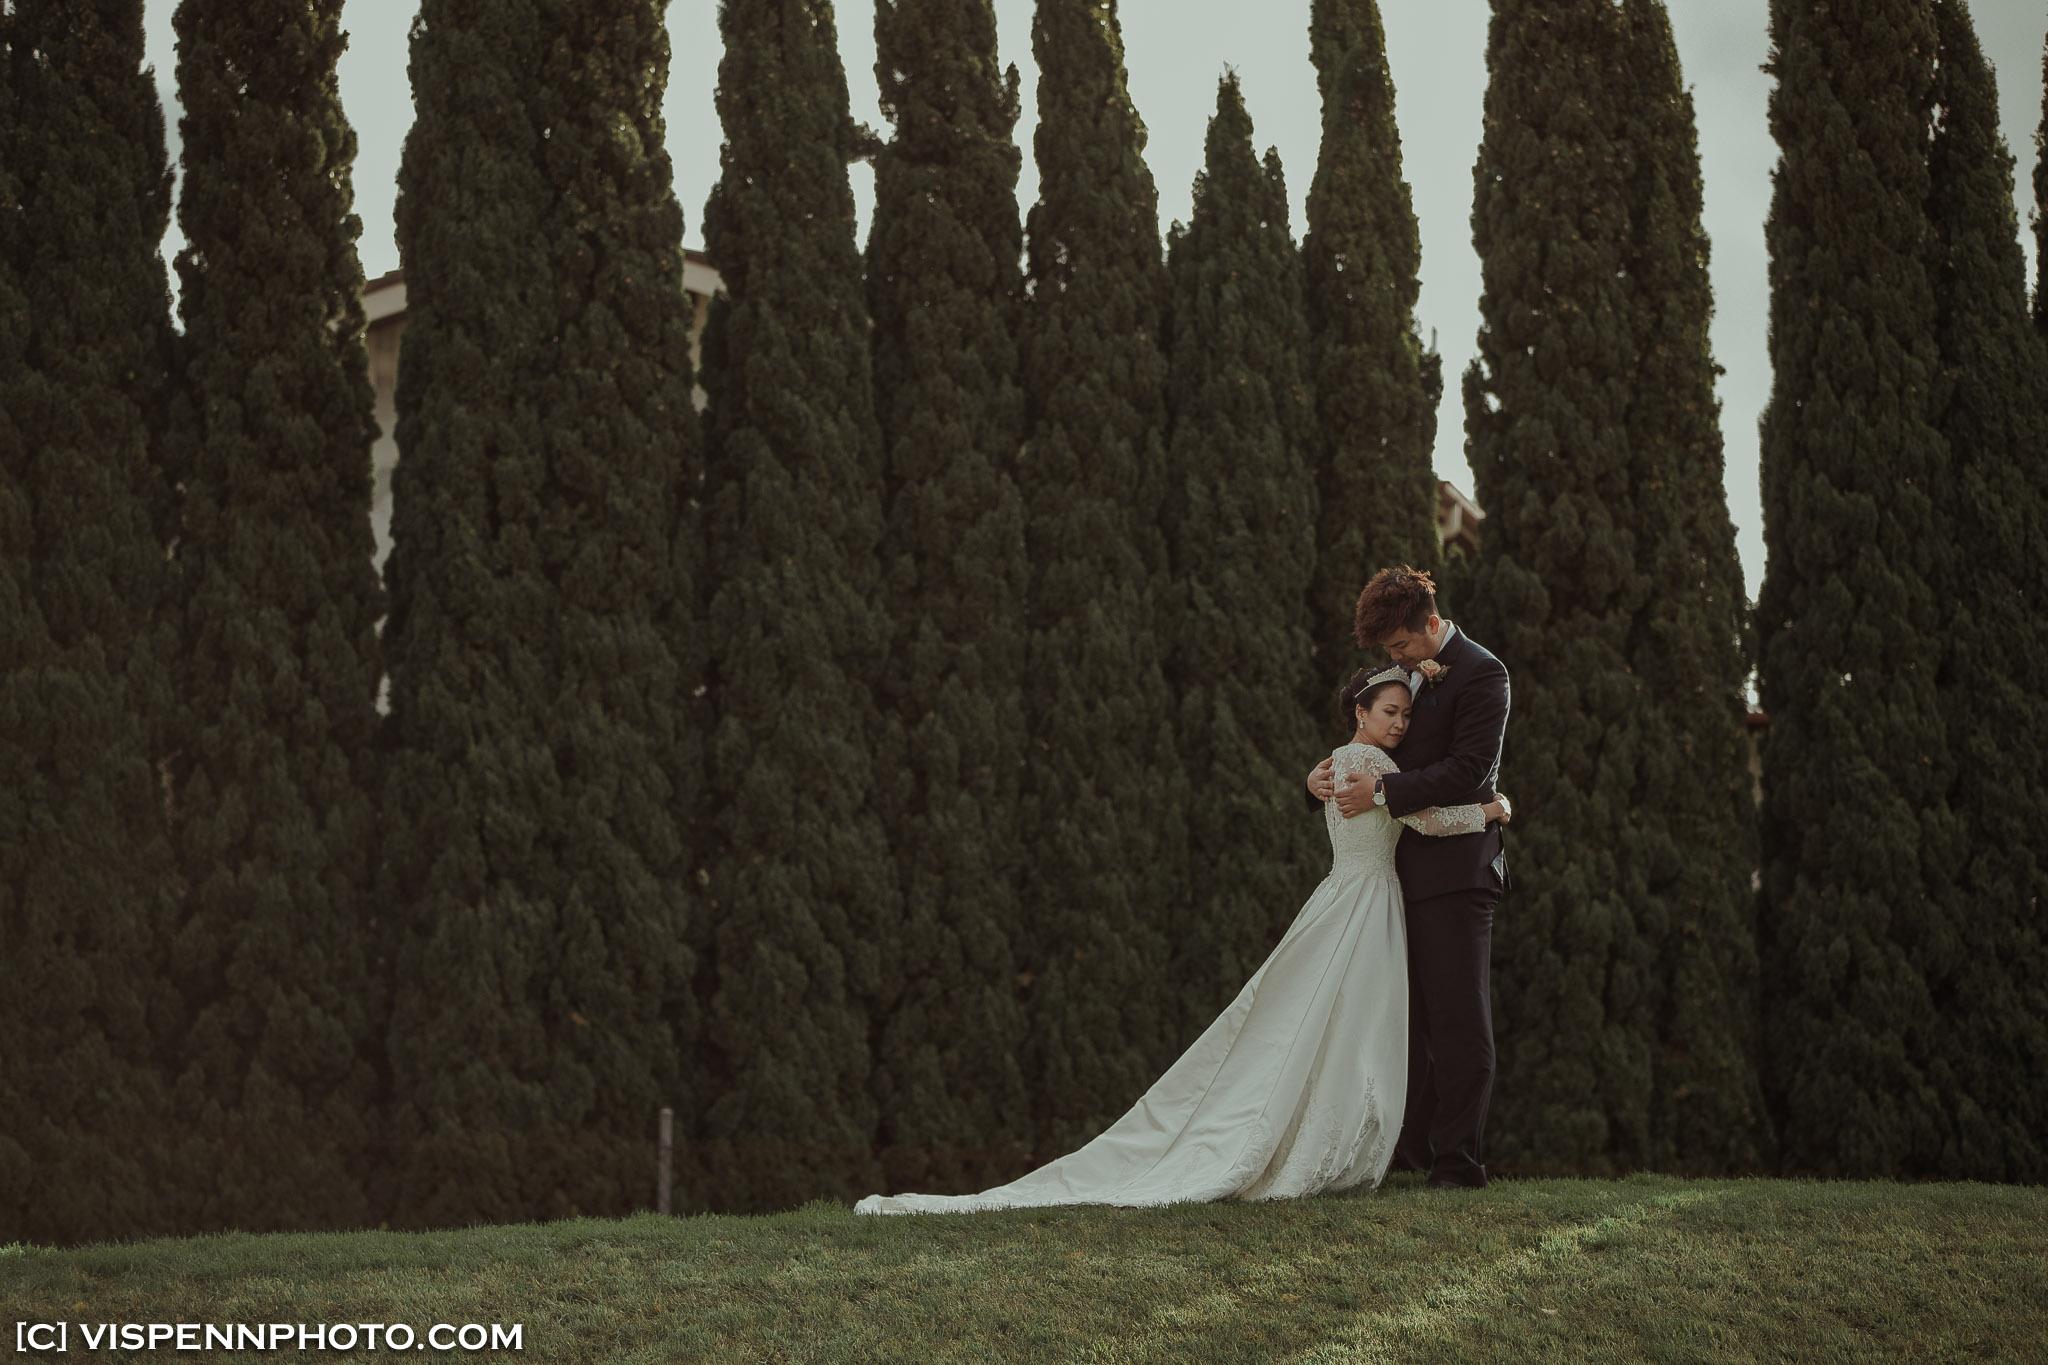 WEDDING DAY Photography Melbourne VISPENN 墨尔本 婚礼跟拍 婚礼摄像 婚礼摄影 结婚照 登记照 CoreyCoco 3P 07894 1DX VISPENN